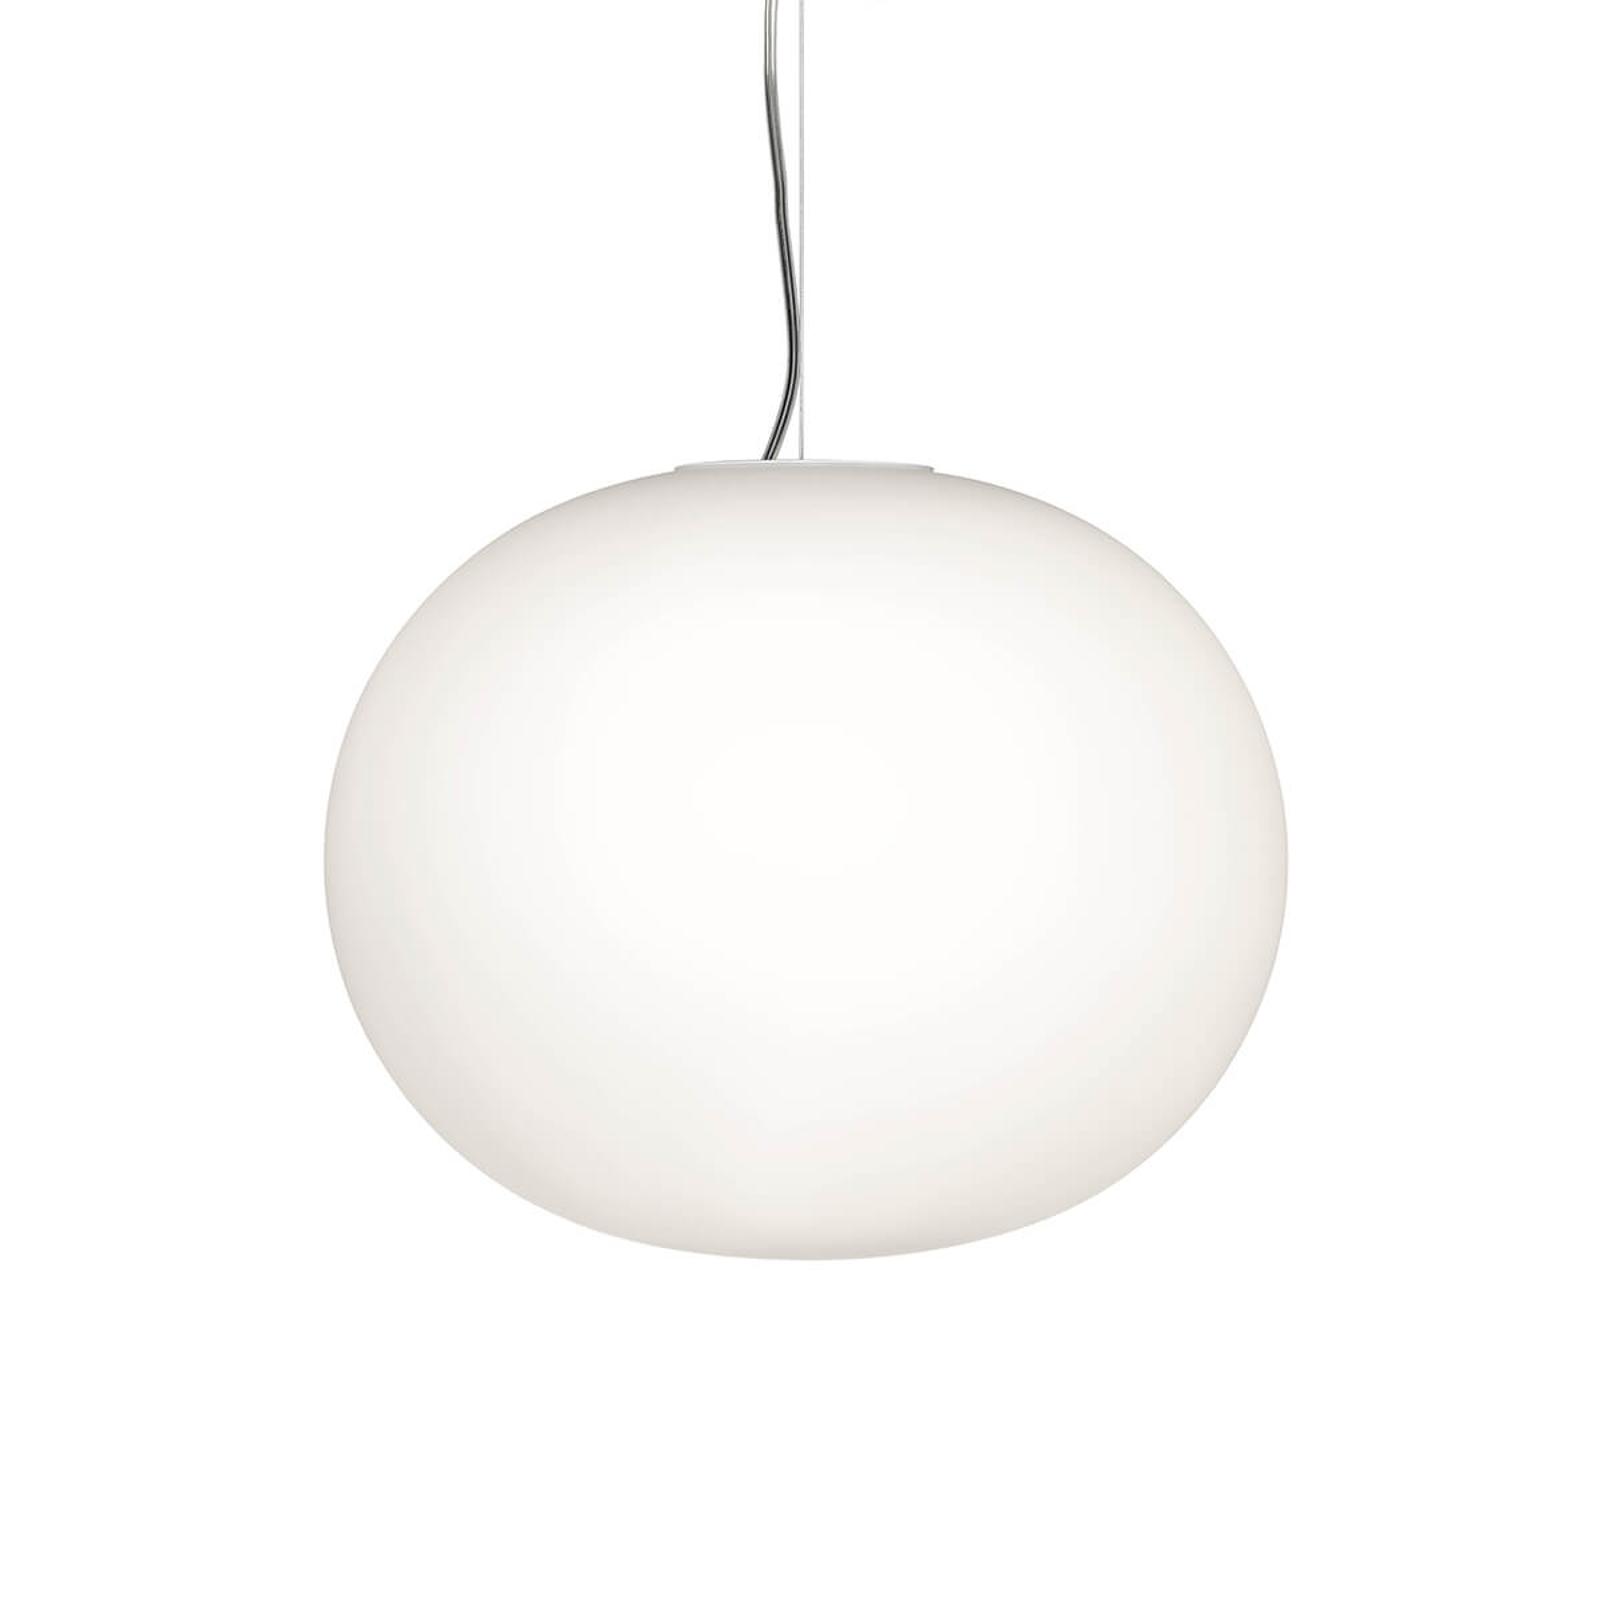 Kulerund GLO-BALL pendellampe 33 cm